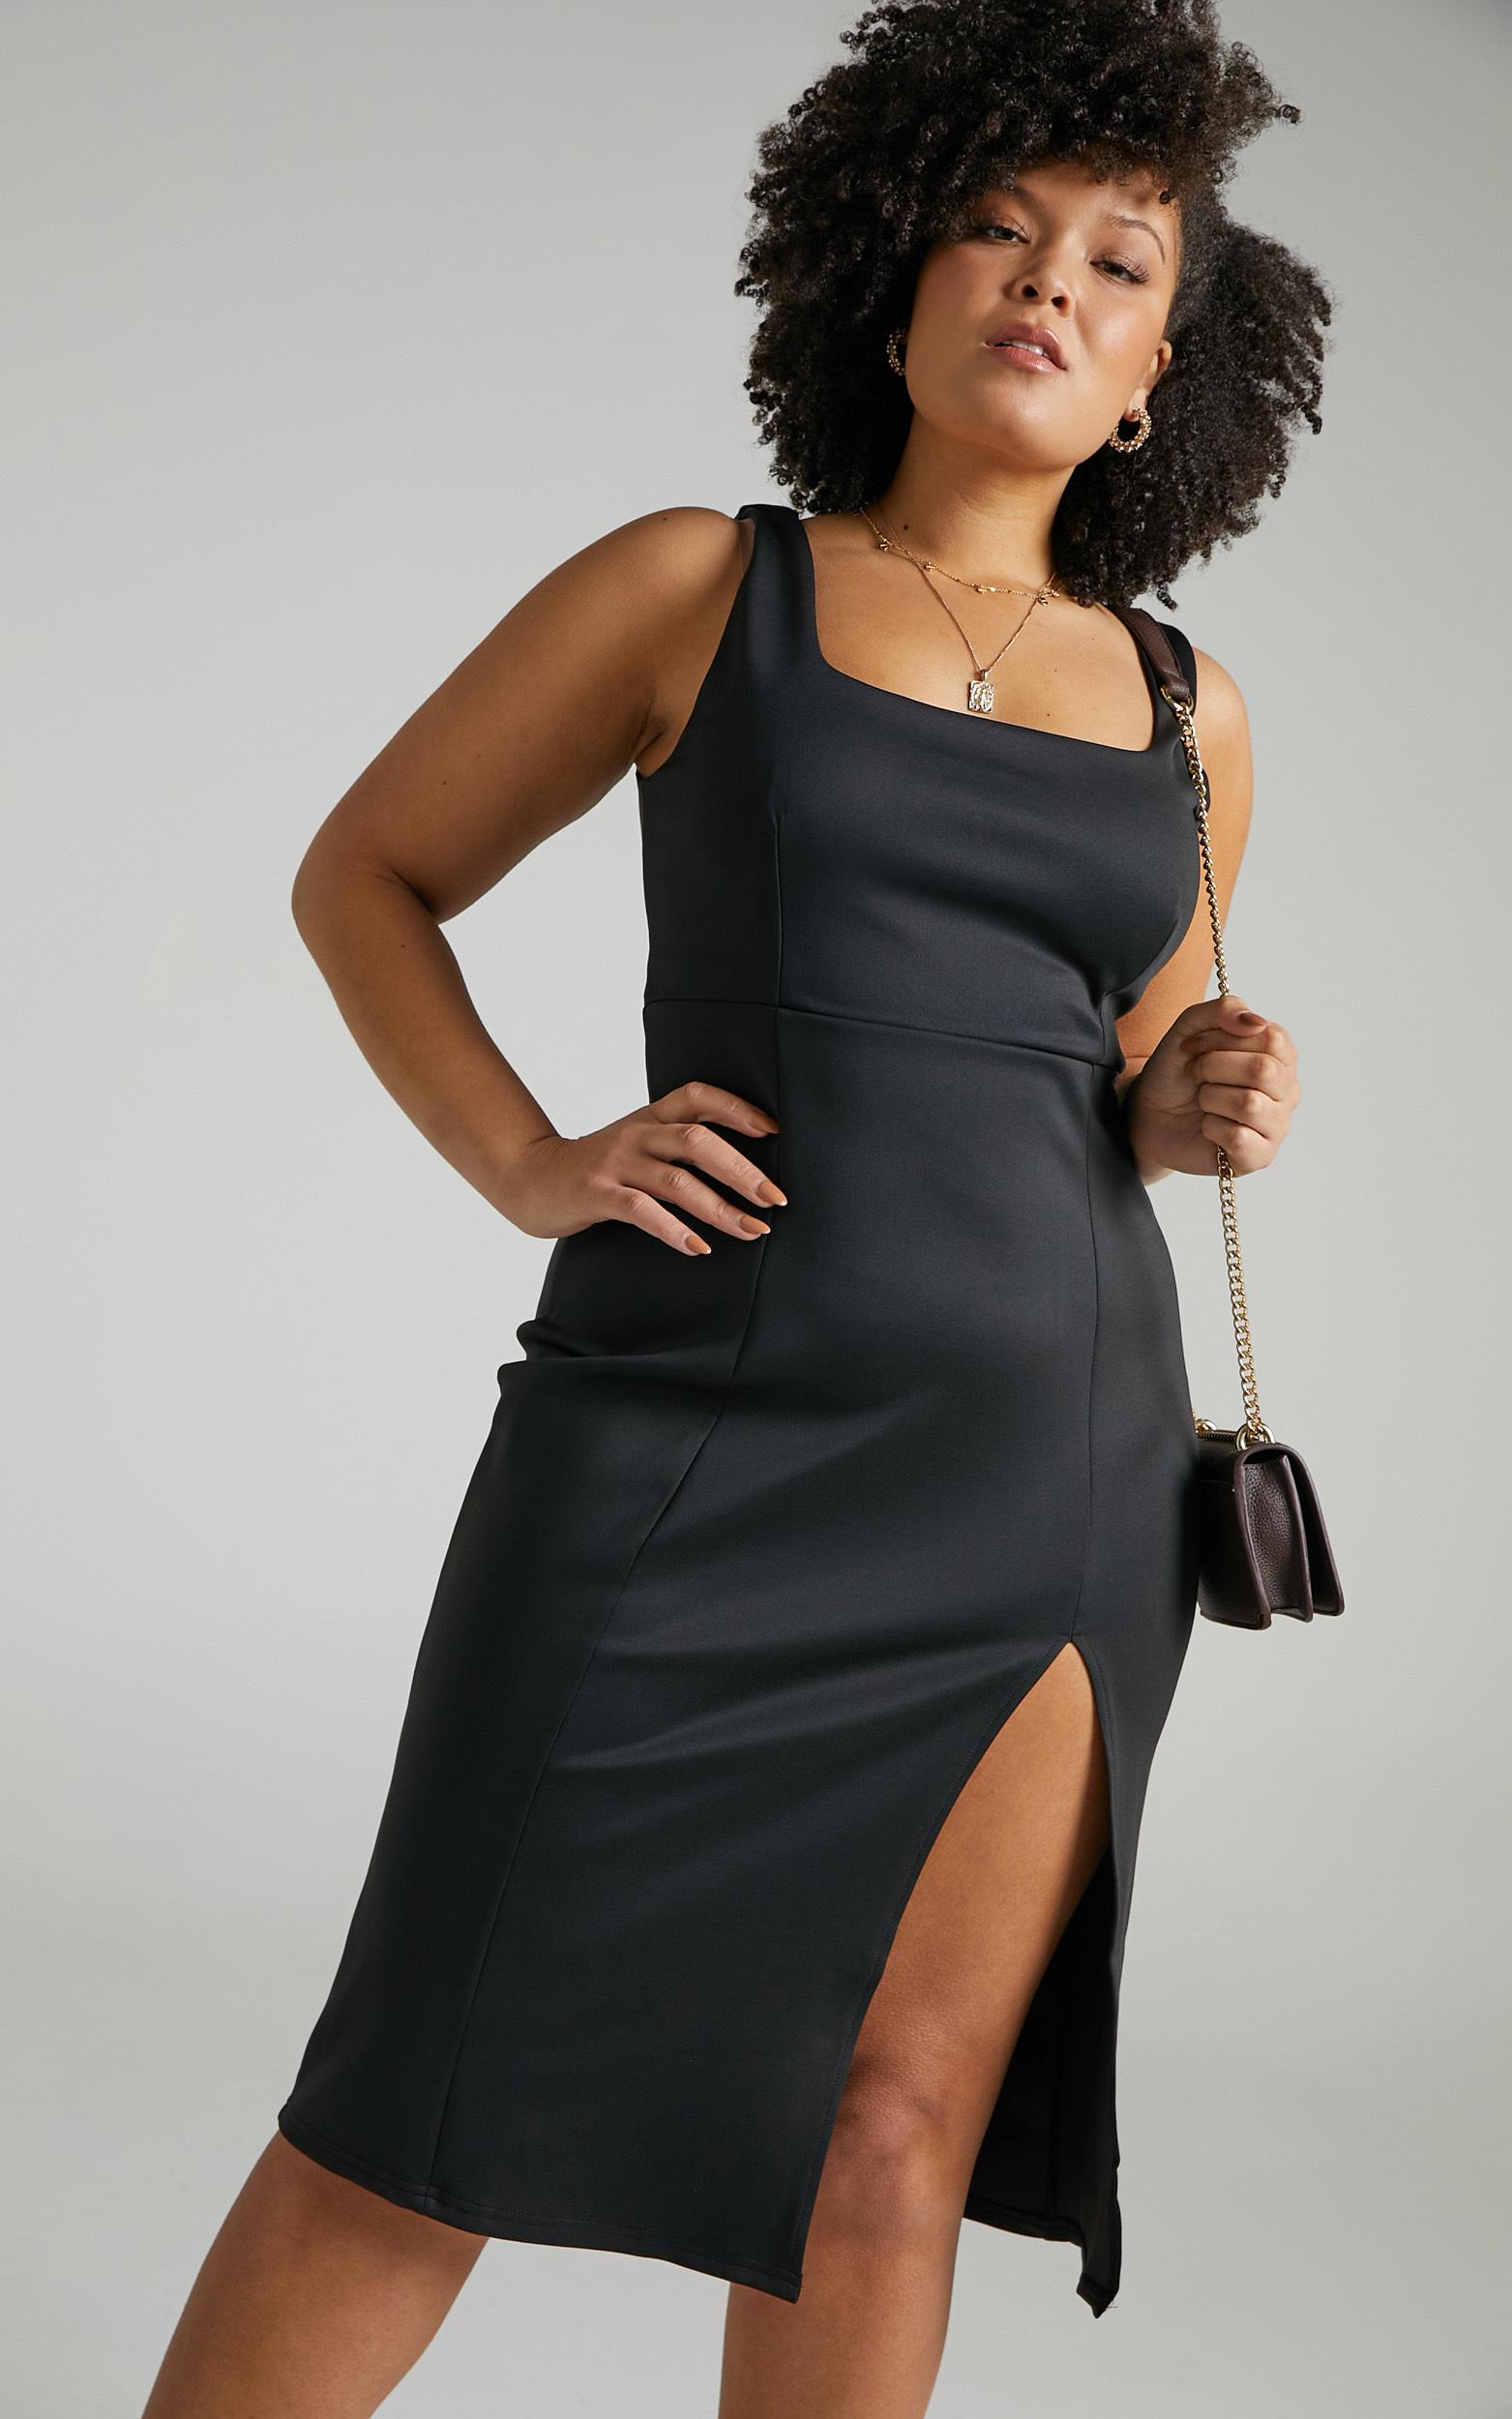 Mini Love Dress in Black - 06, BLK1, hi-res image number null